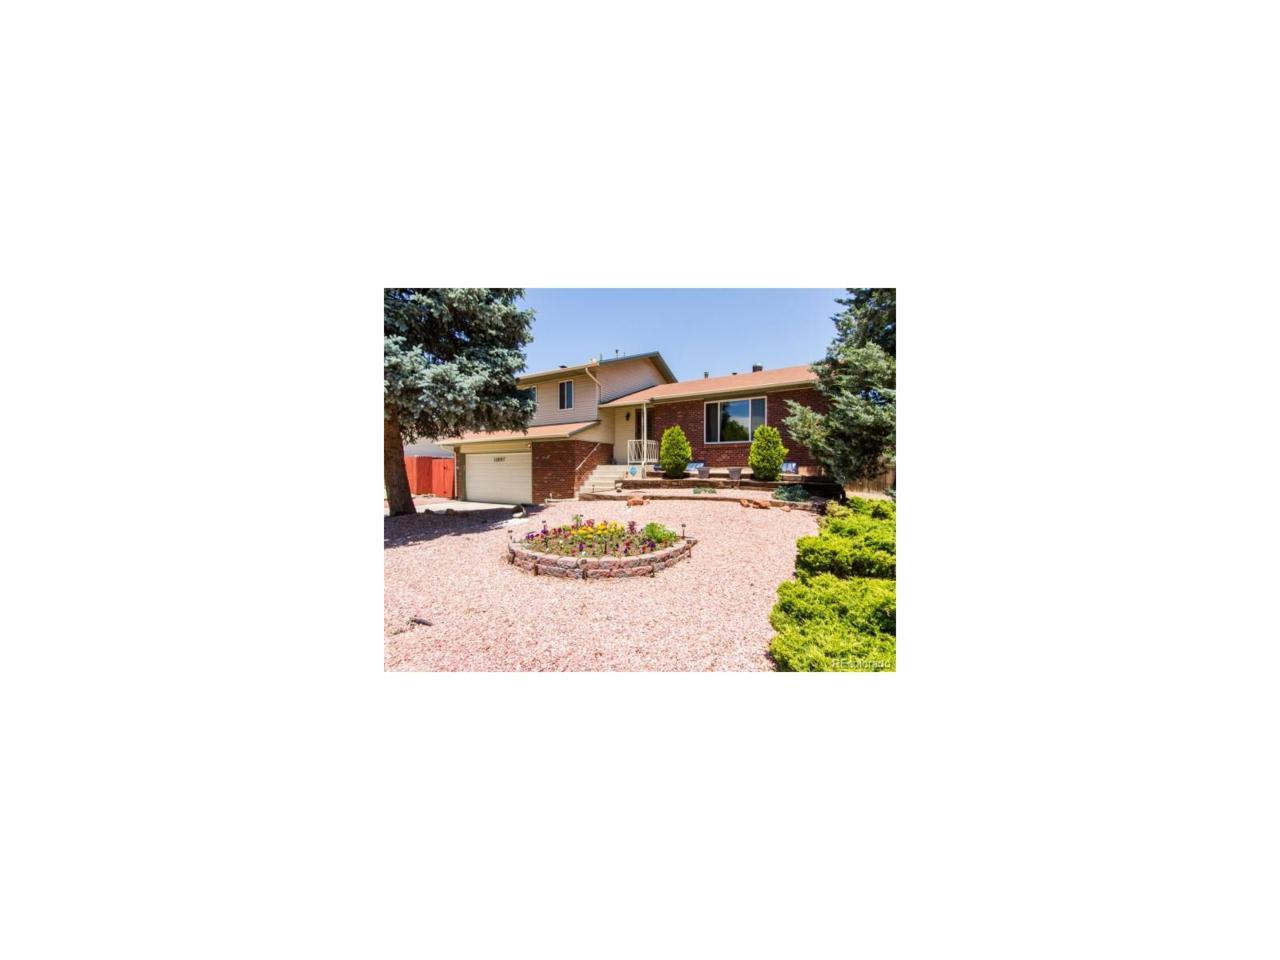 11997 E Utah Place, Aurora, CO 80012 (MLS #2088562) :: 8z Real Estate